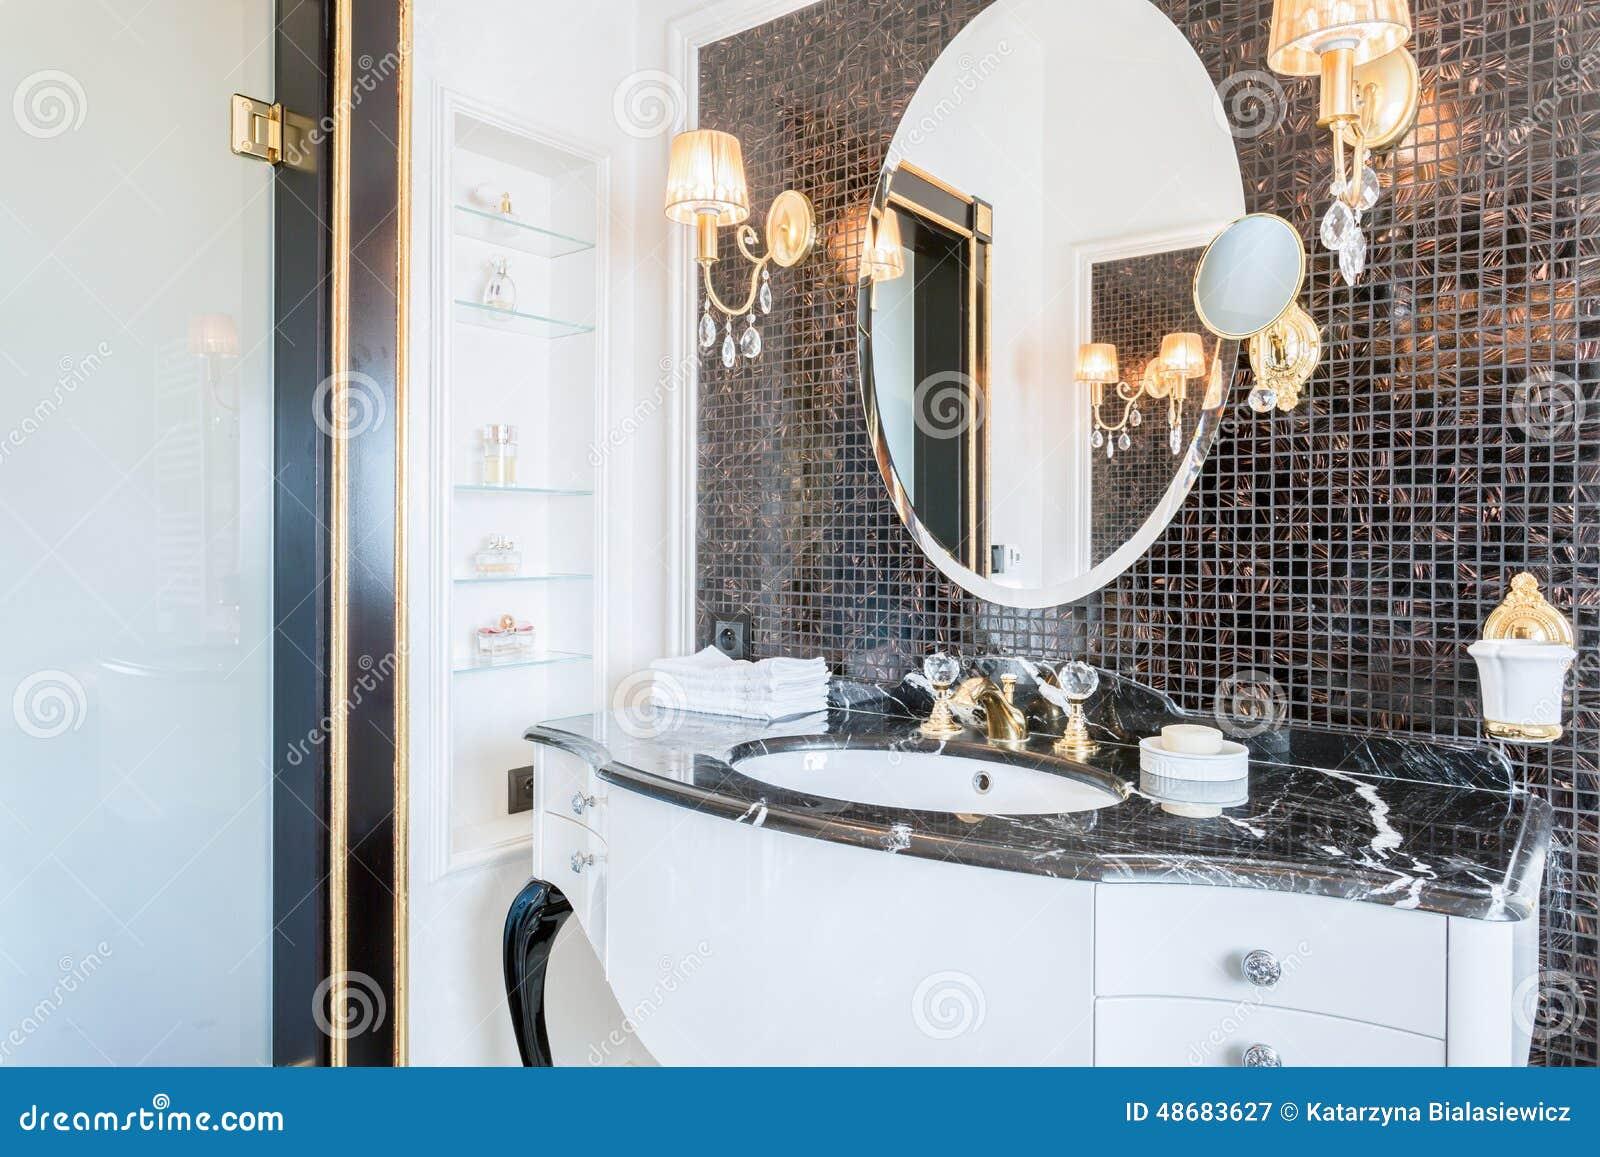 Svartvitt badrum foton – 51 svartvitt badrum bilder, fotografi ...